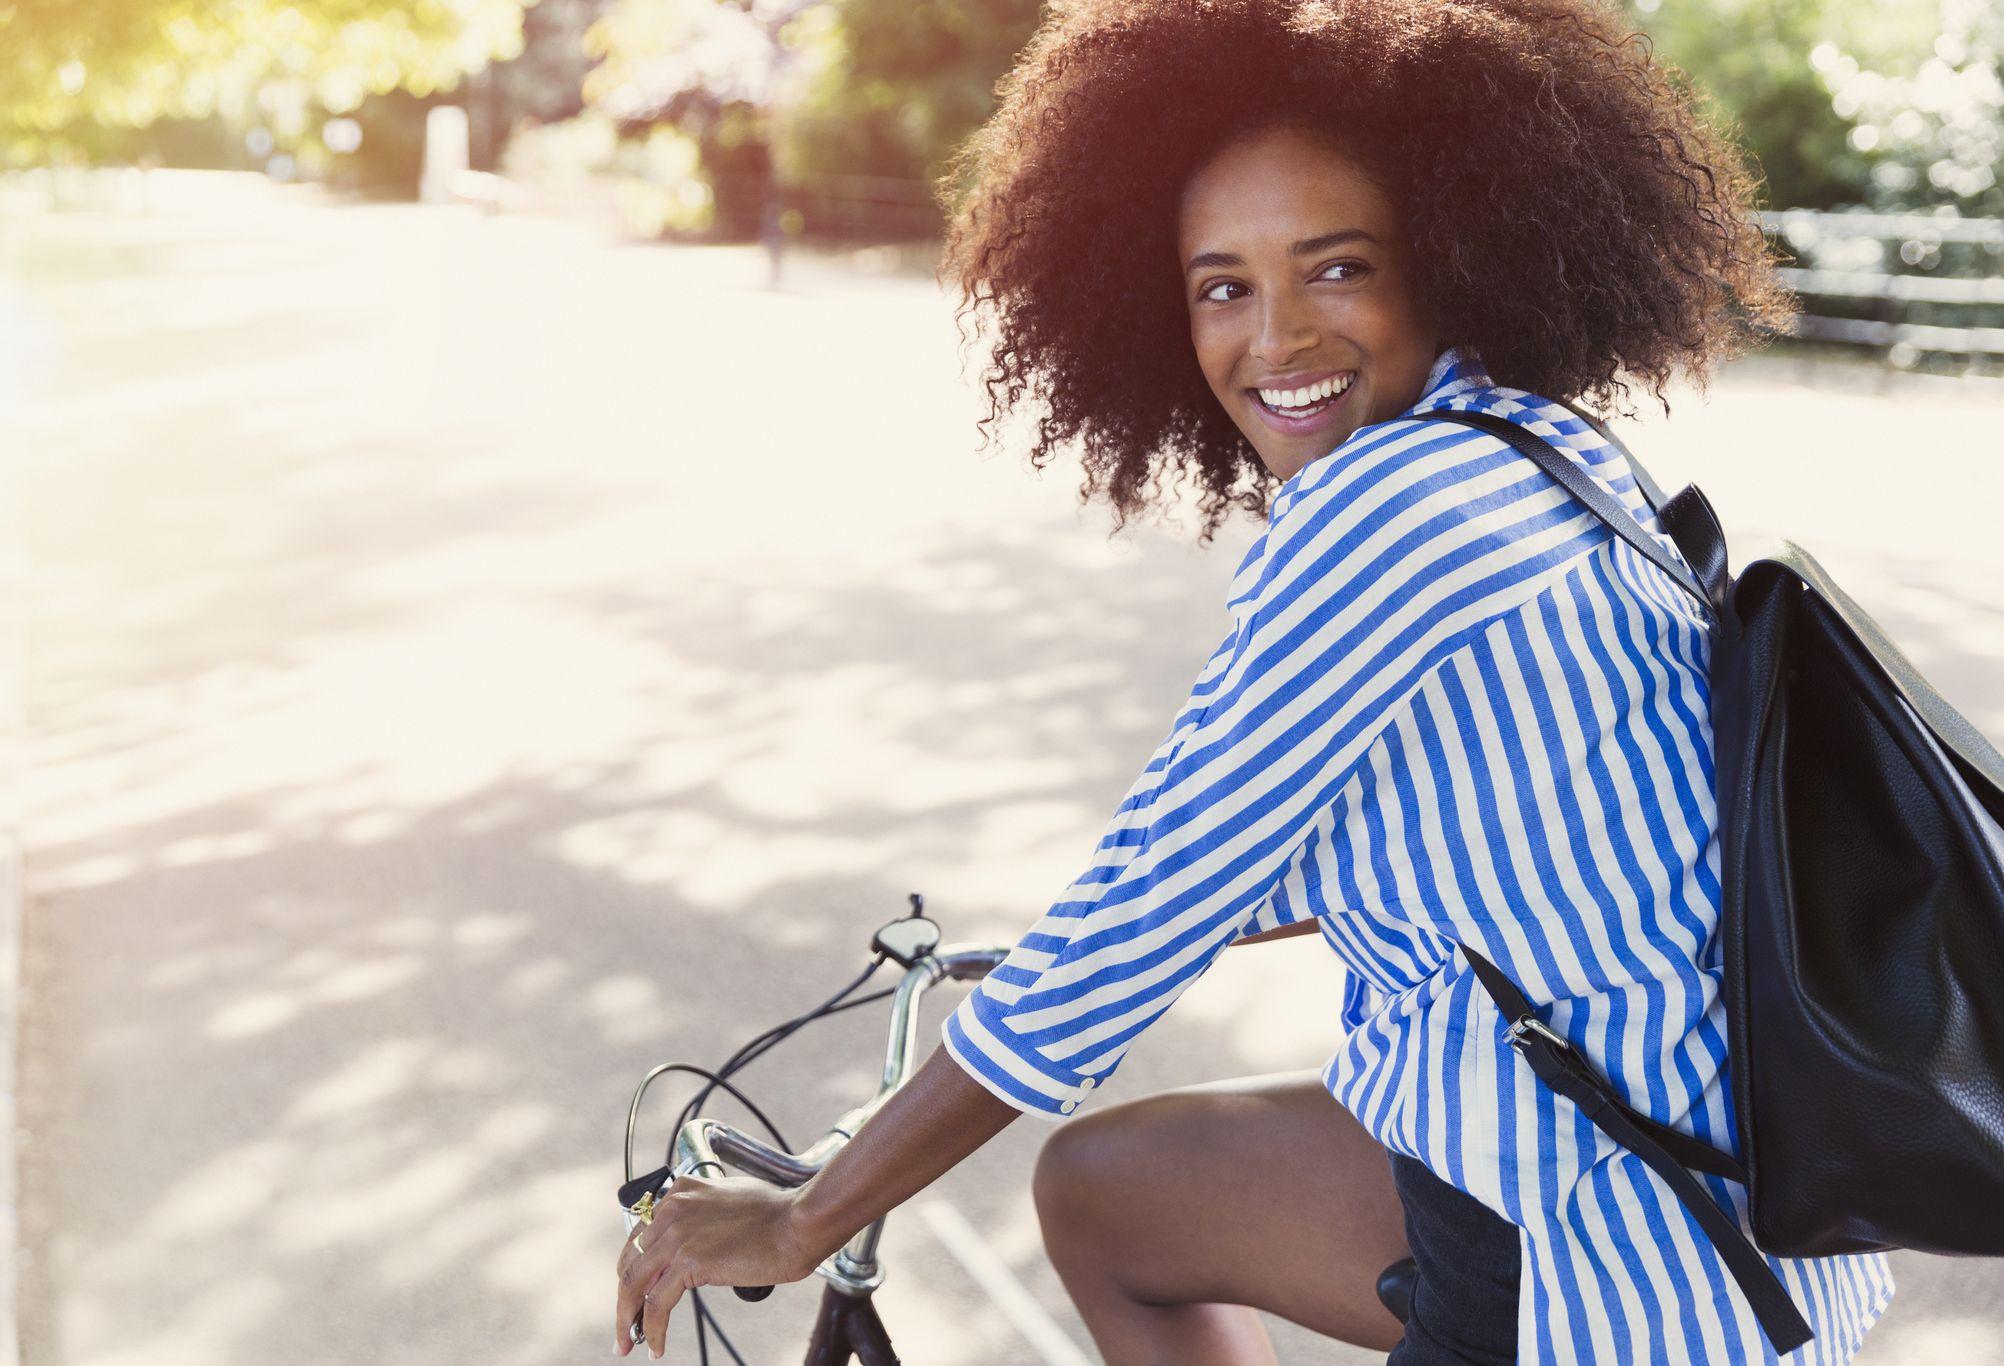 5 Life-Changing Benefits of Bike Riding